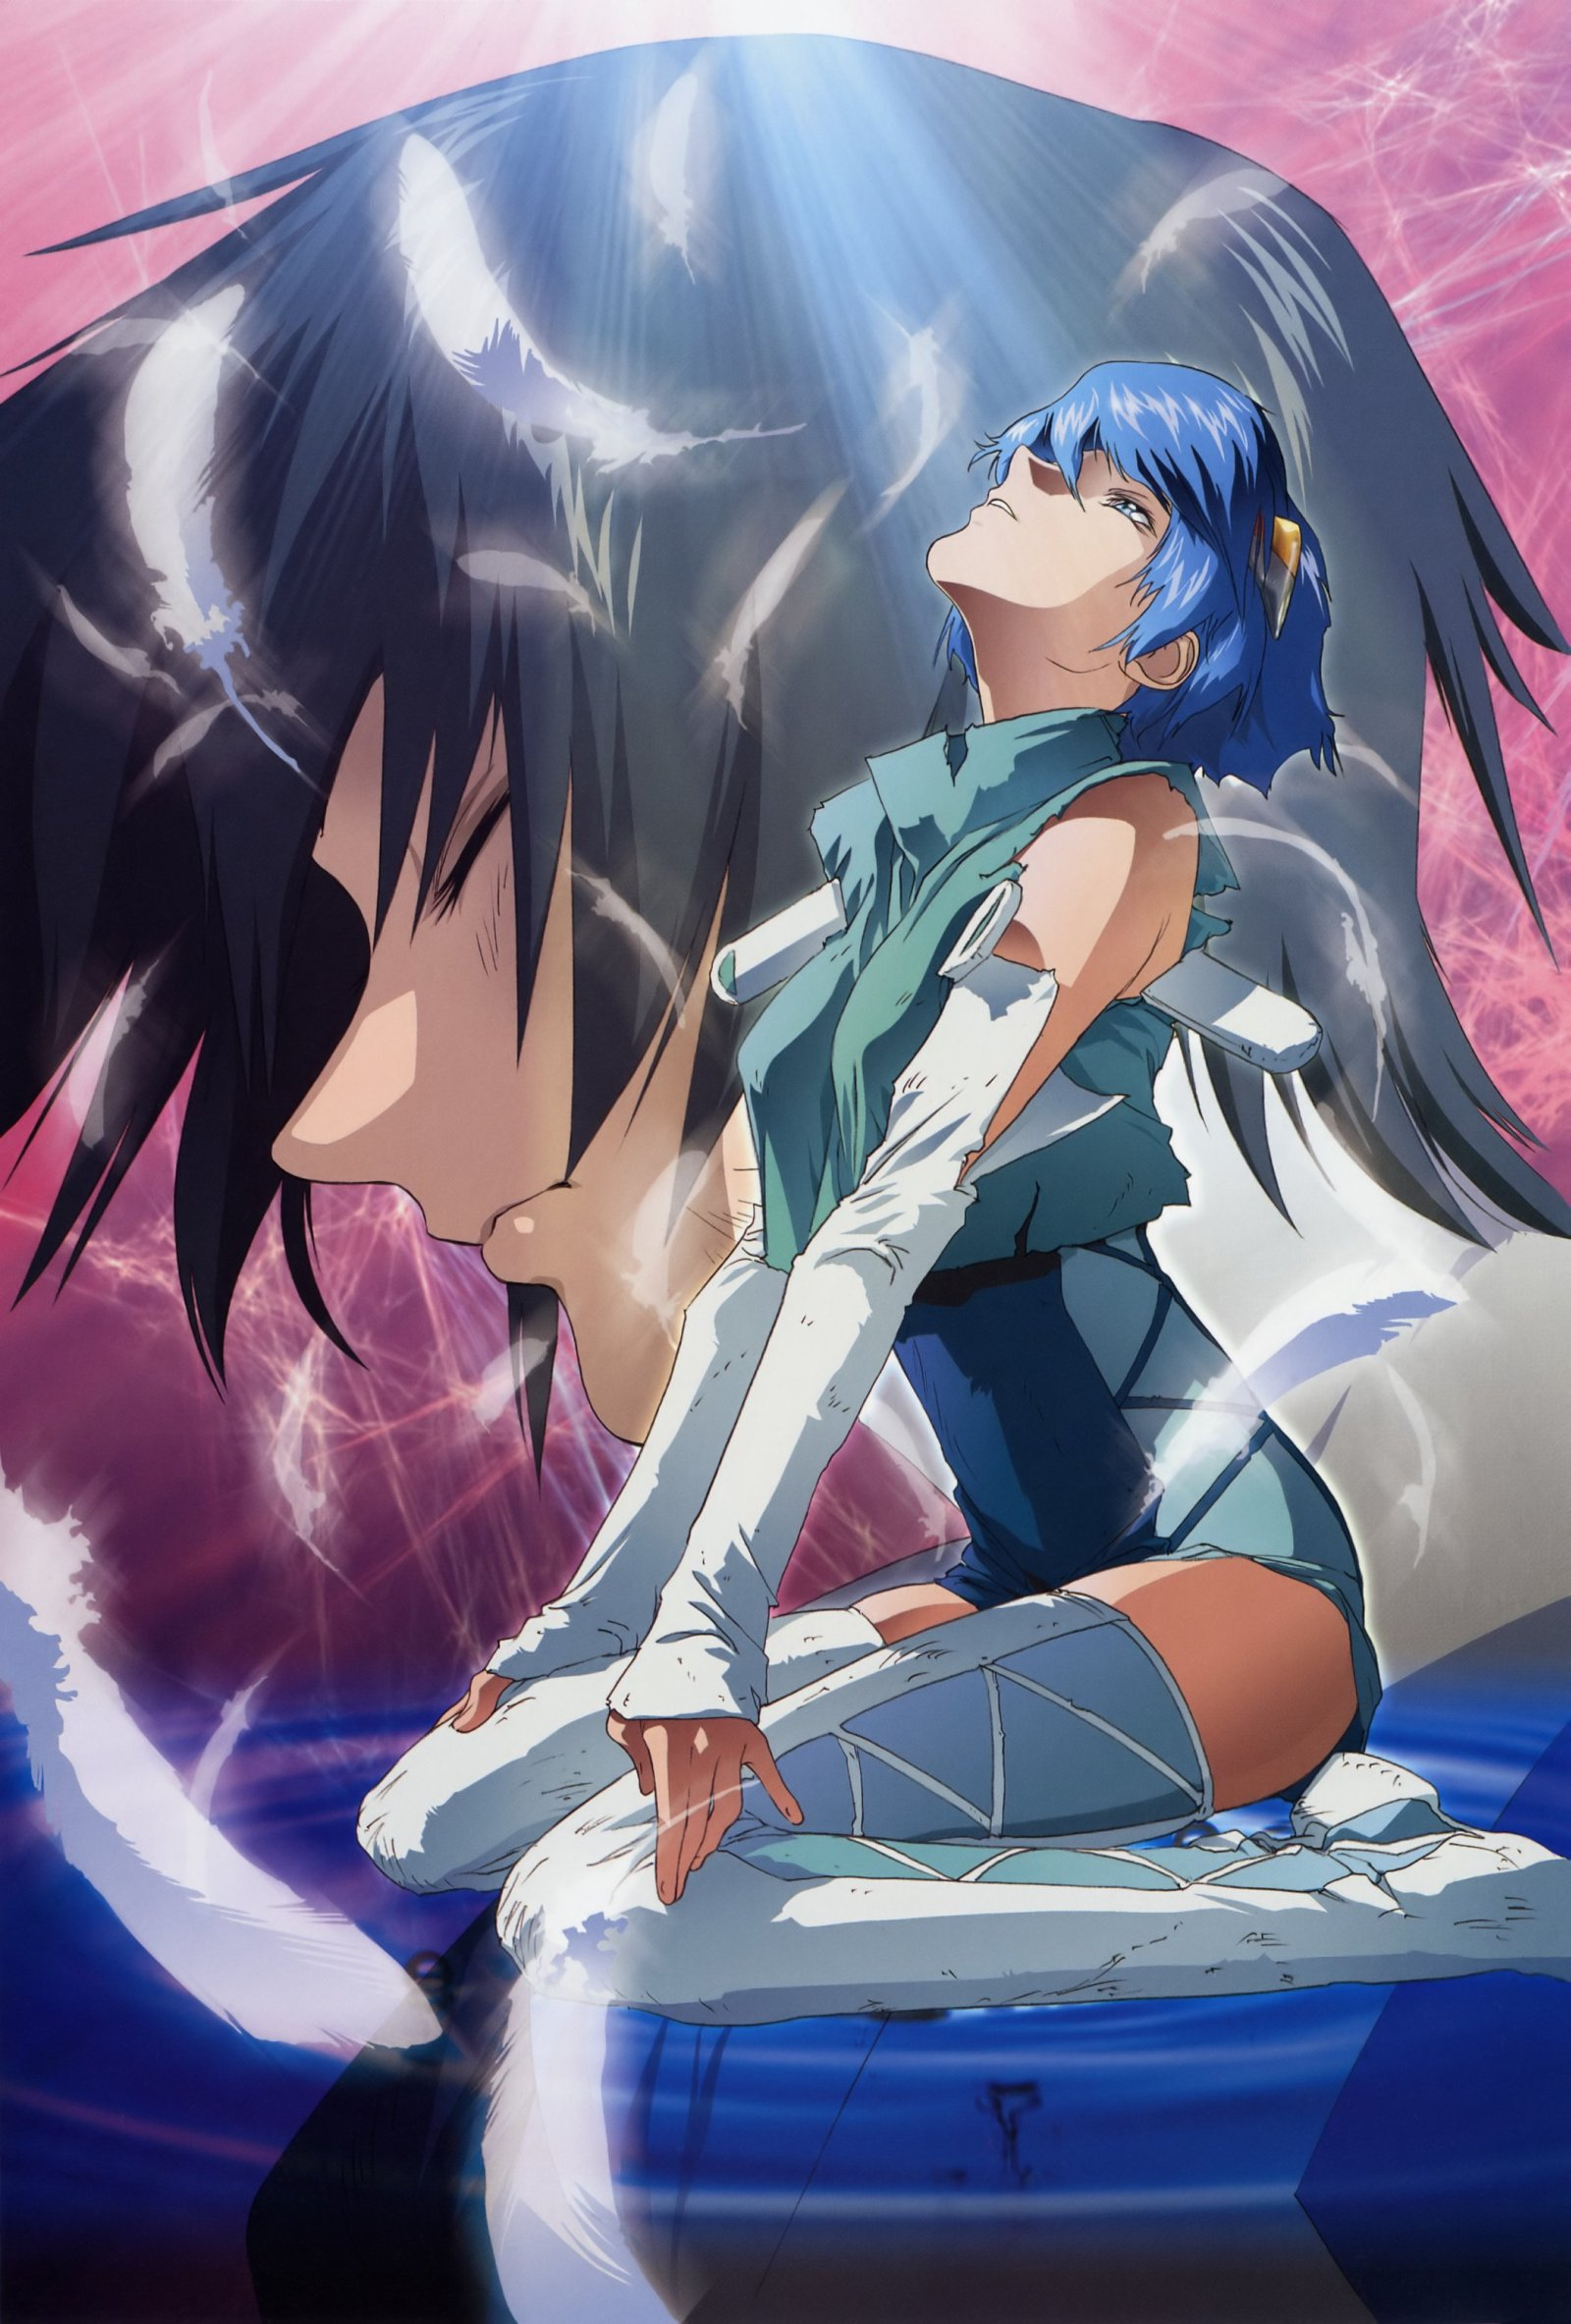 tairen_ryuhou и sherrice_adjani из аниме Скрайд / Scryed